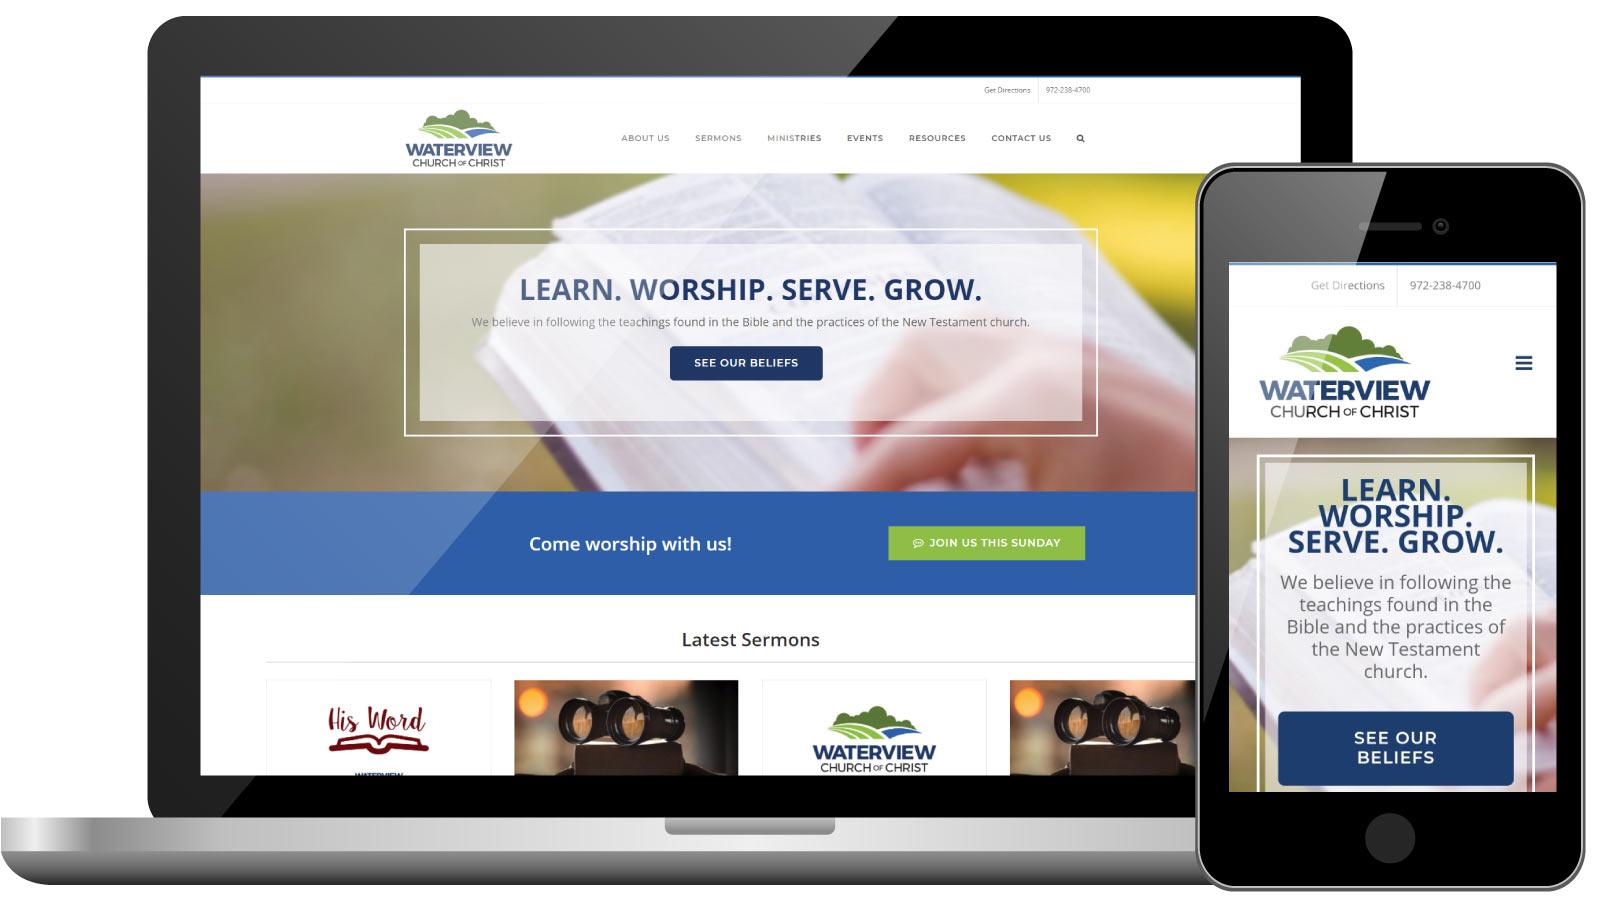 Waterview church of Christ | Church Website Development | Digital Marketing | Bingham Design